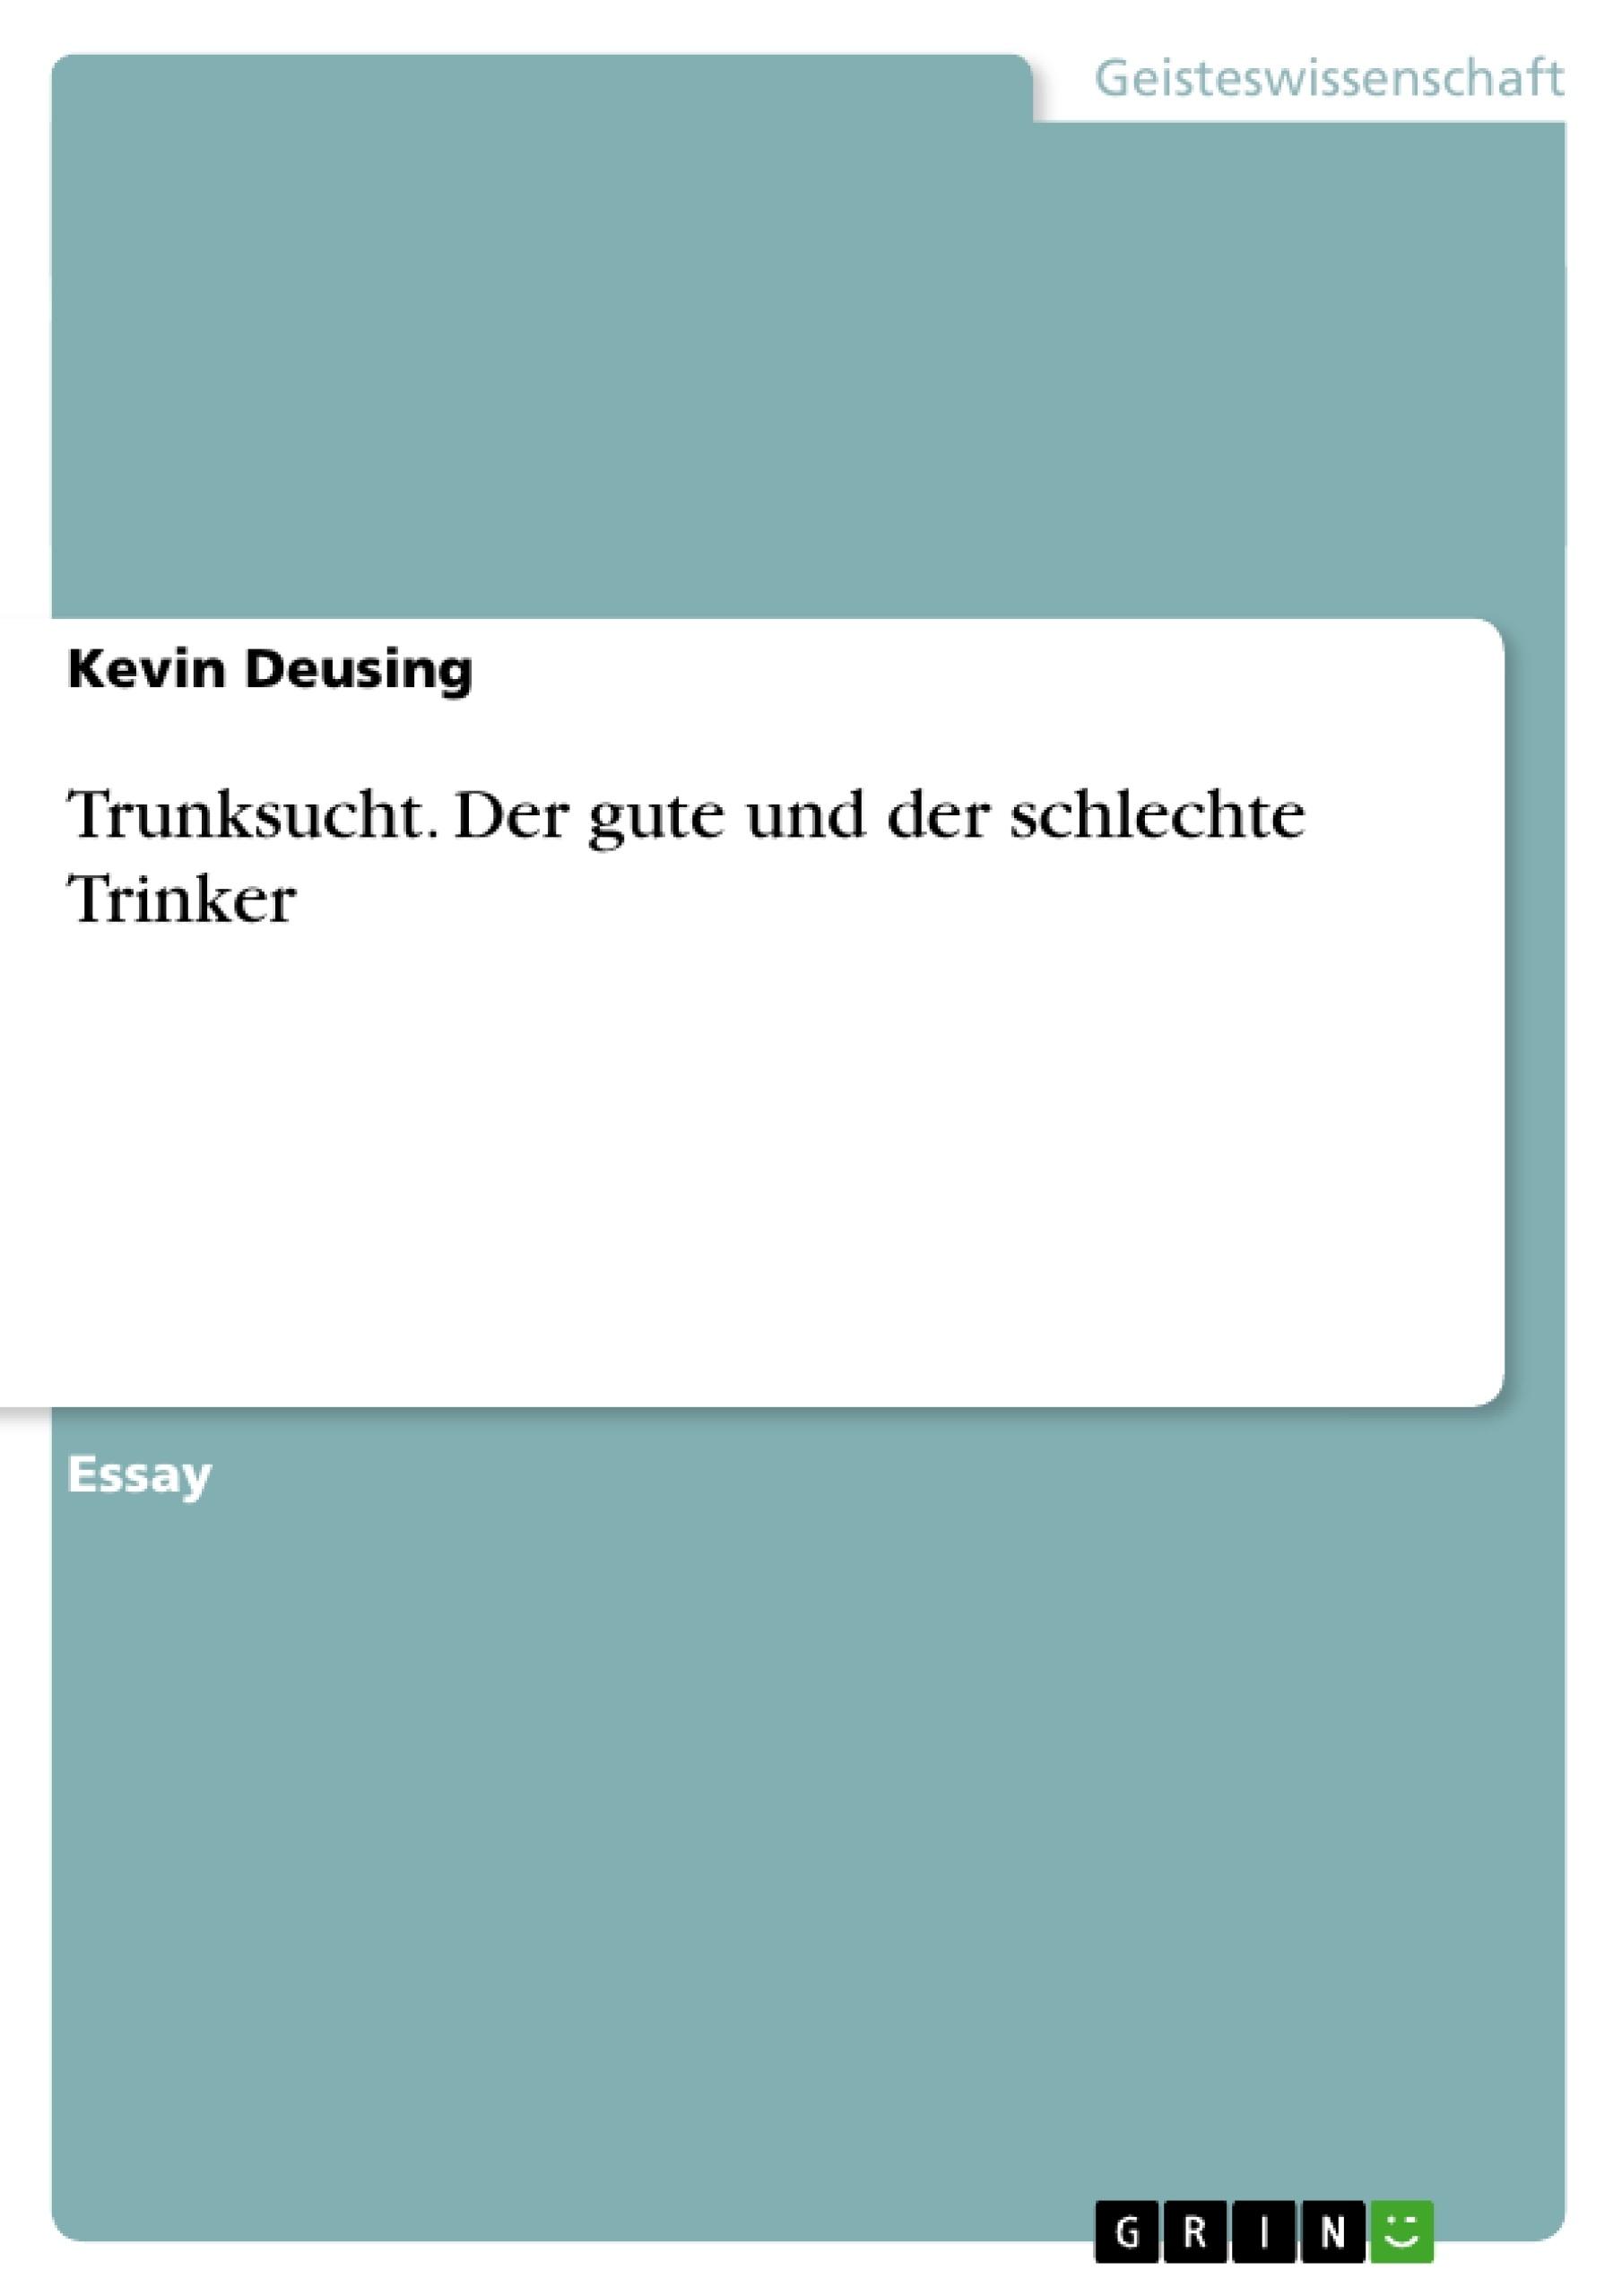 Erfreut Steve Jobs Fortsetzen Bilder - Entry Level Resume Vorlagen ...